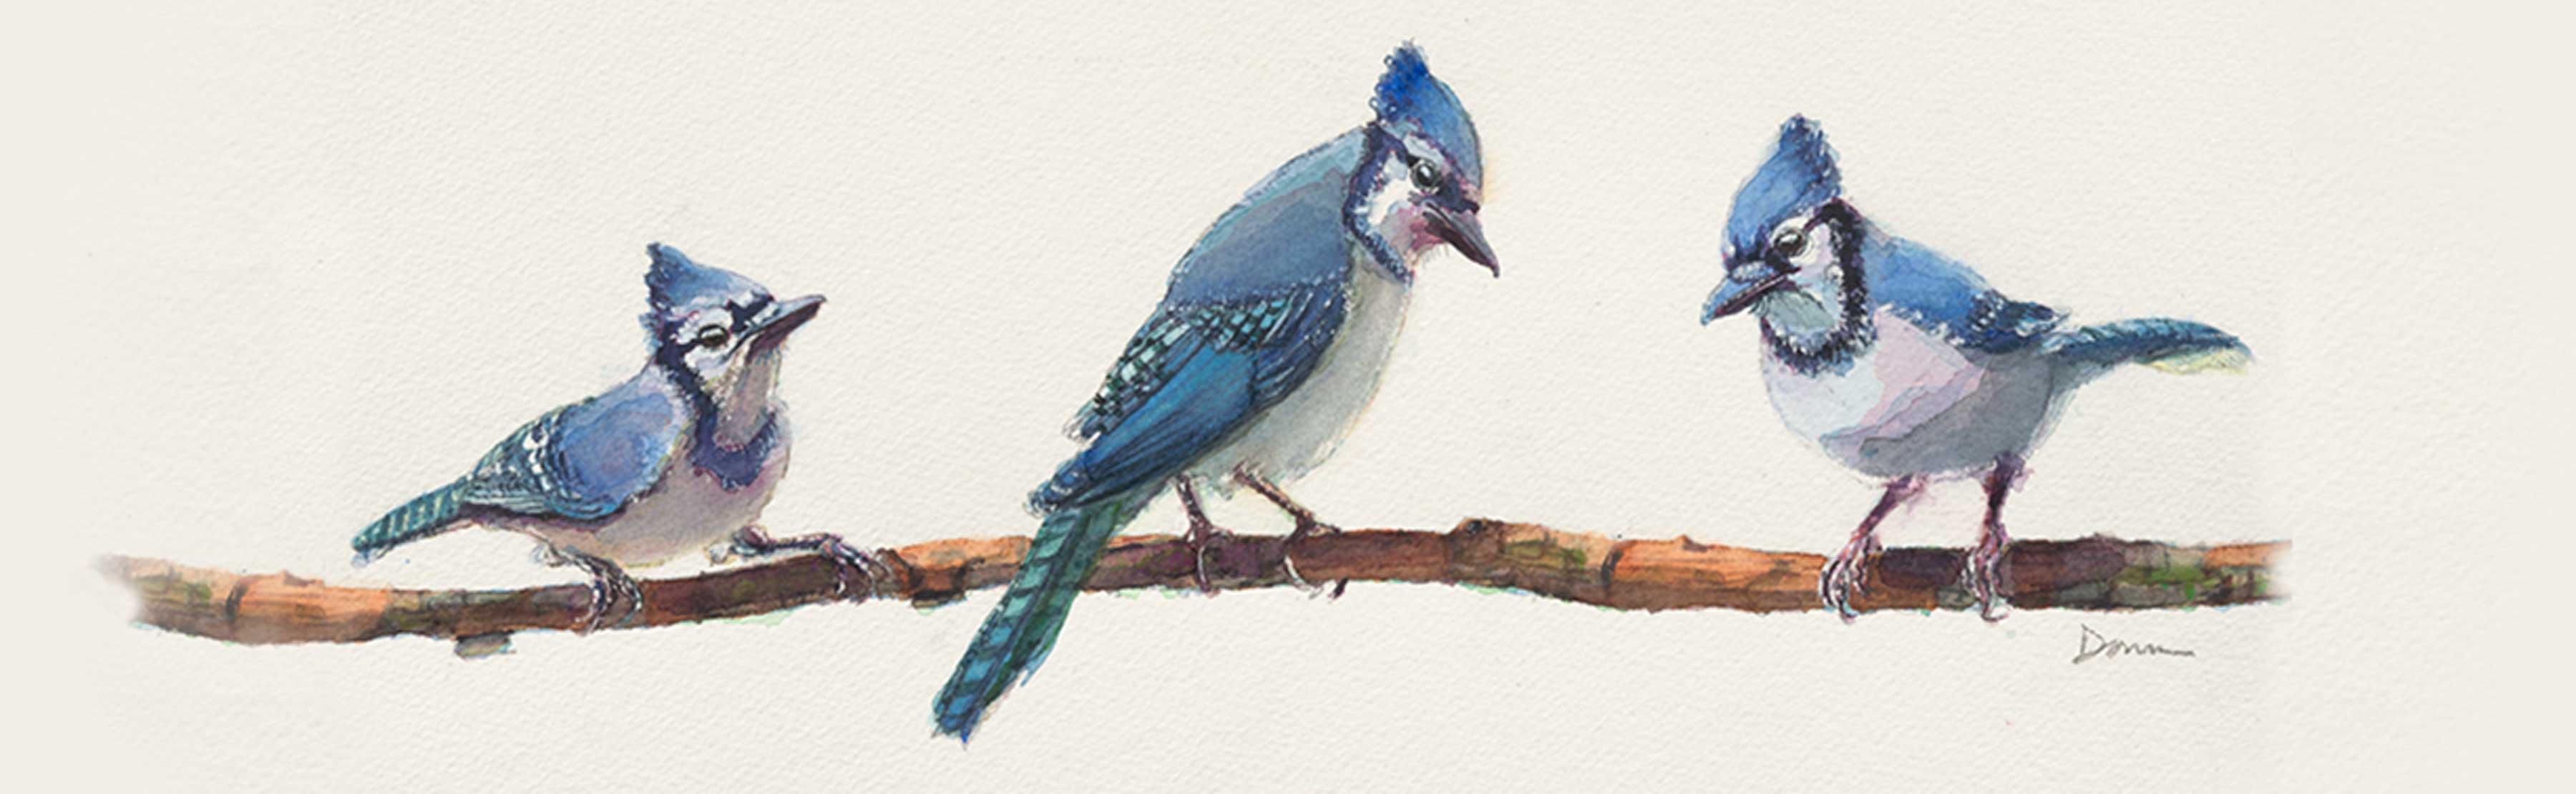 header-background-bluejay-crop